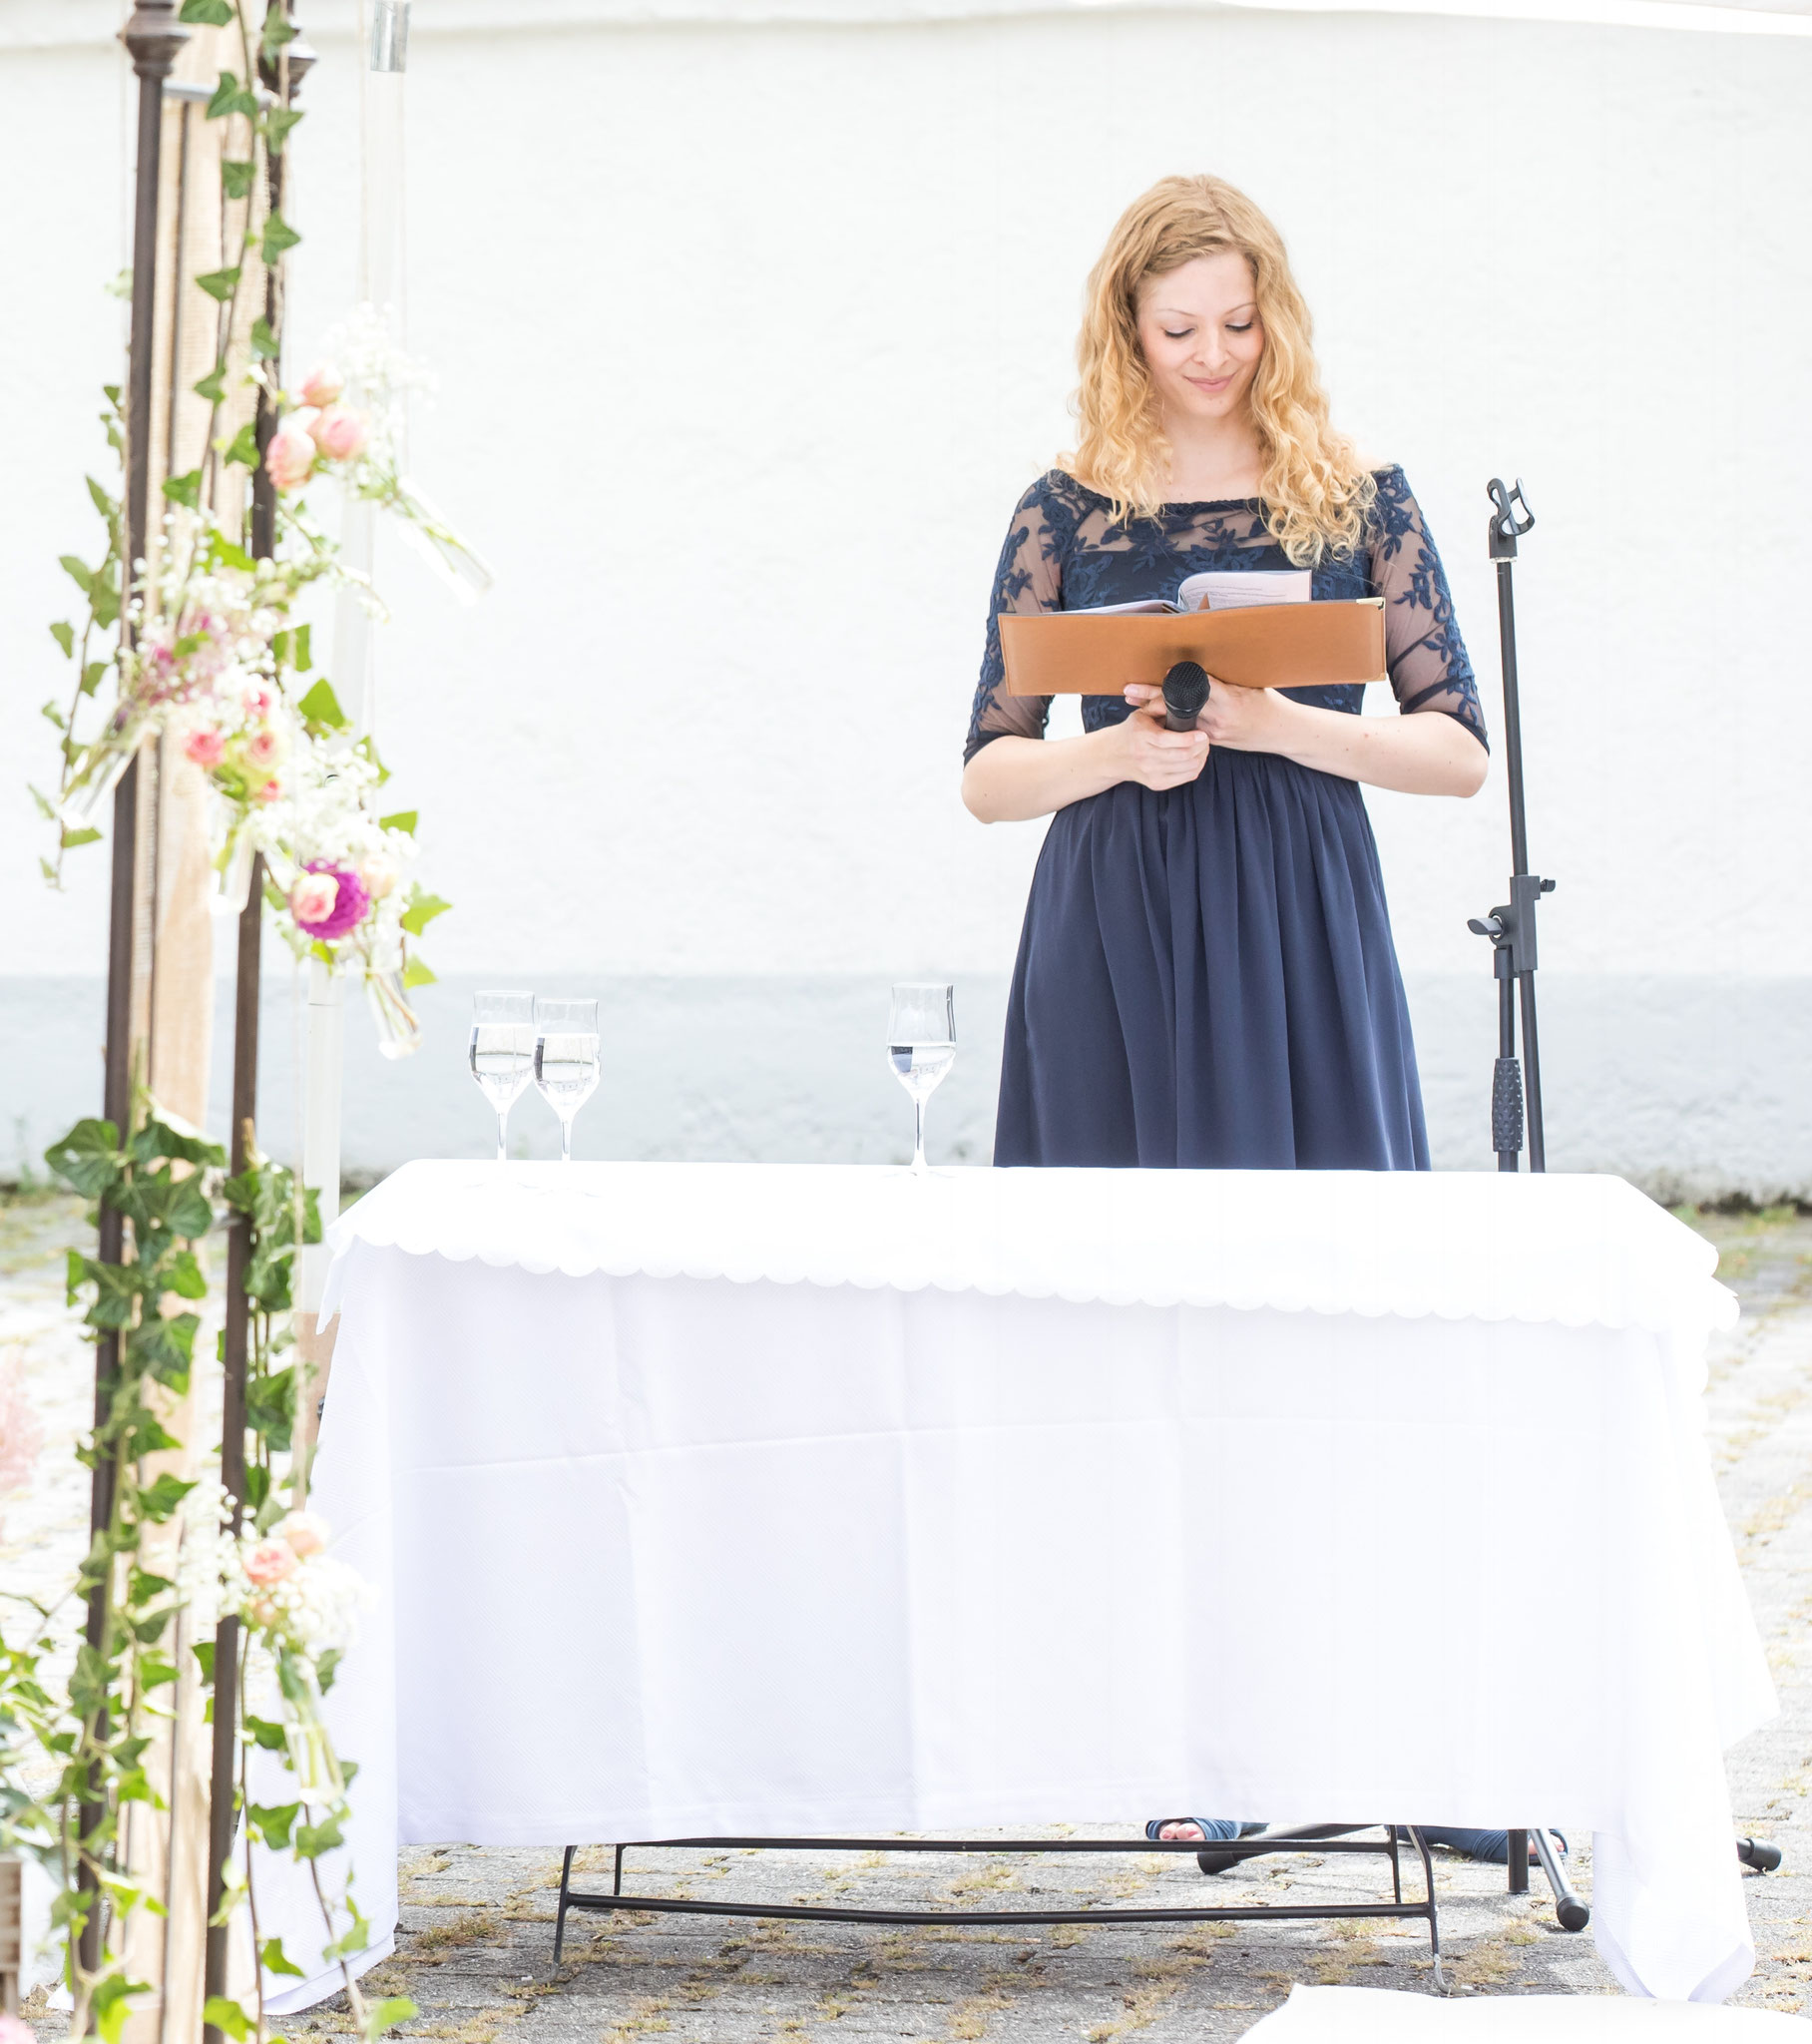 Traurednerin Katharina Lehmkuhl bereitet sich vor (by Robert Klinger)